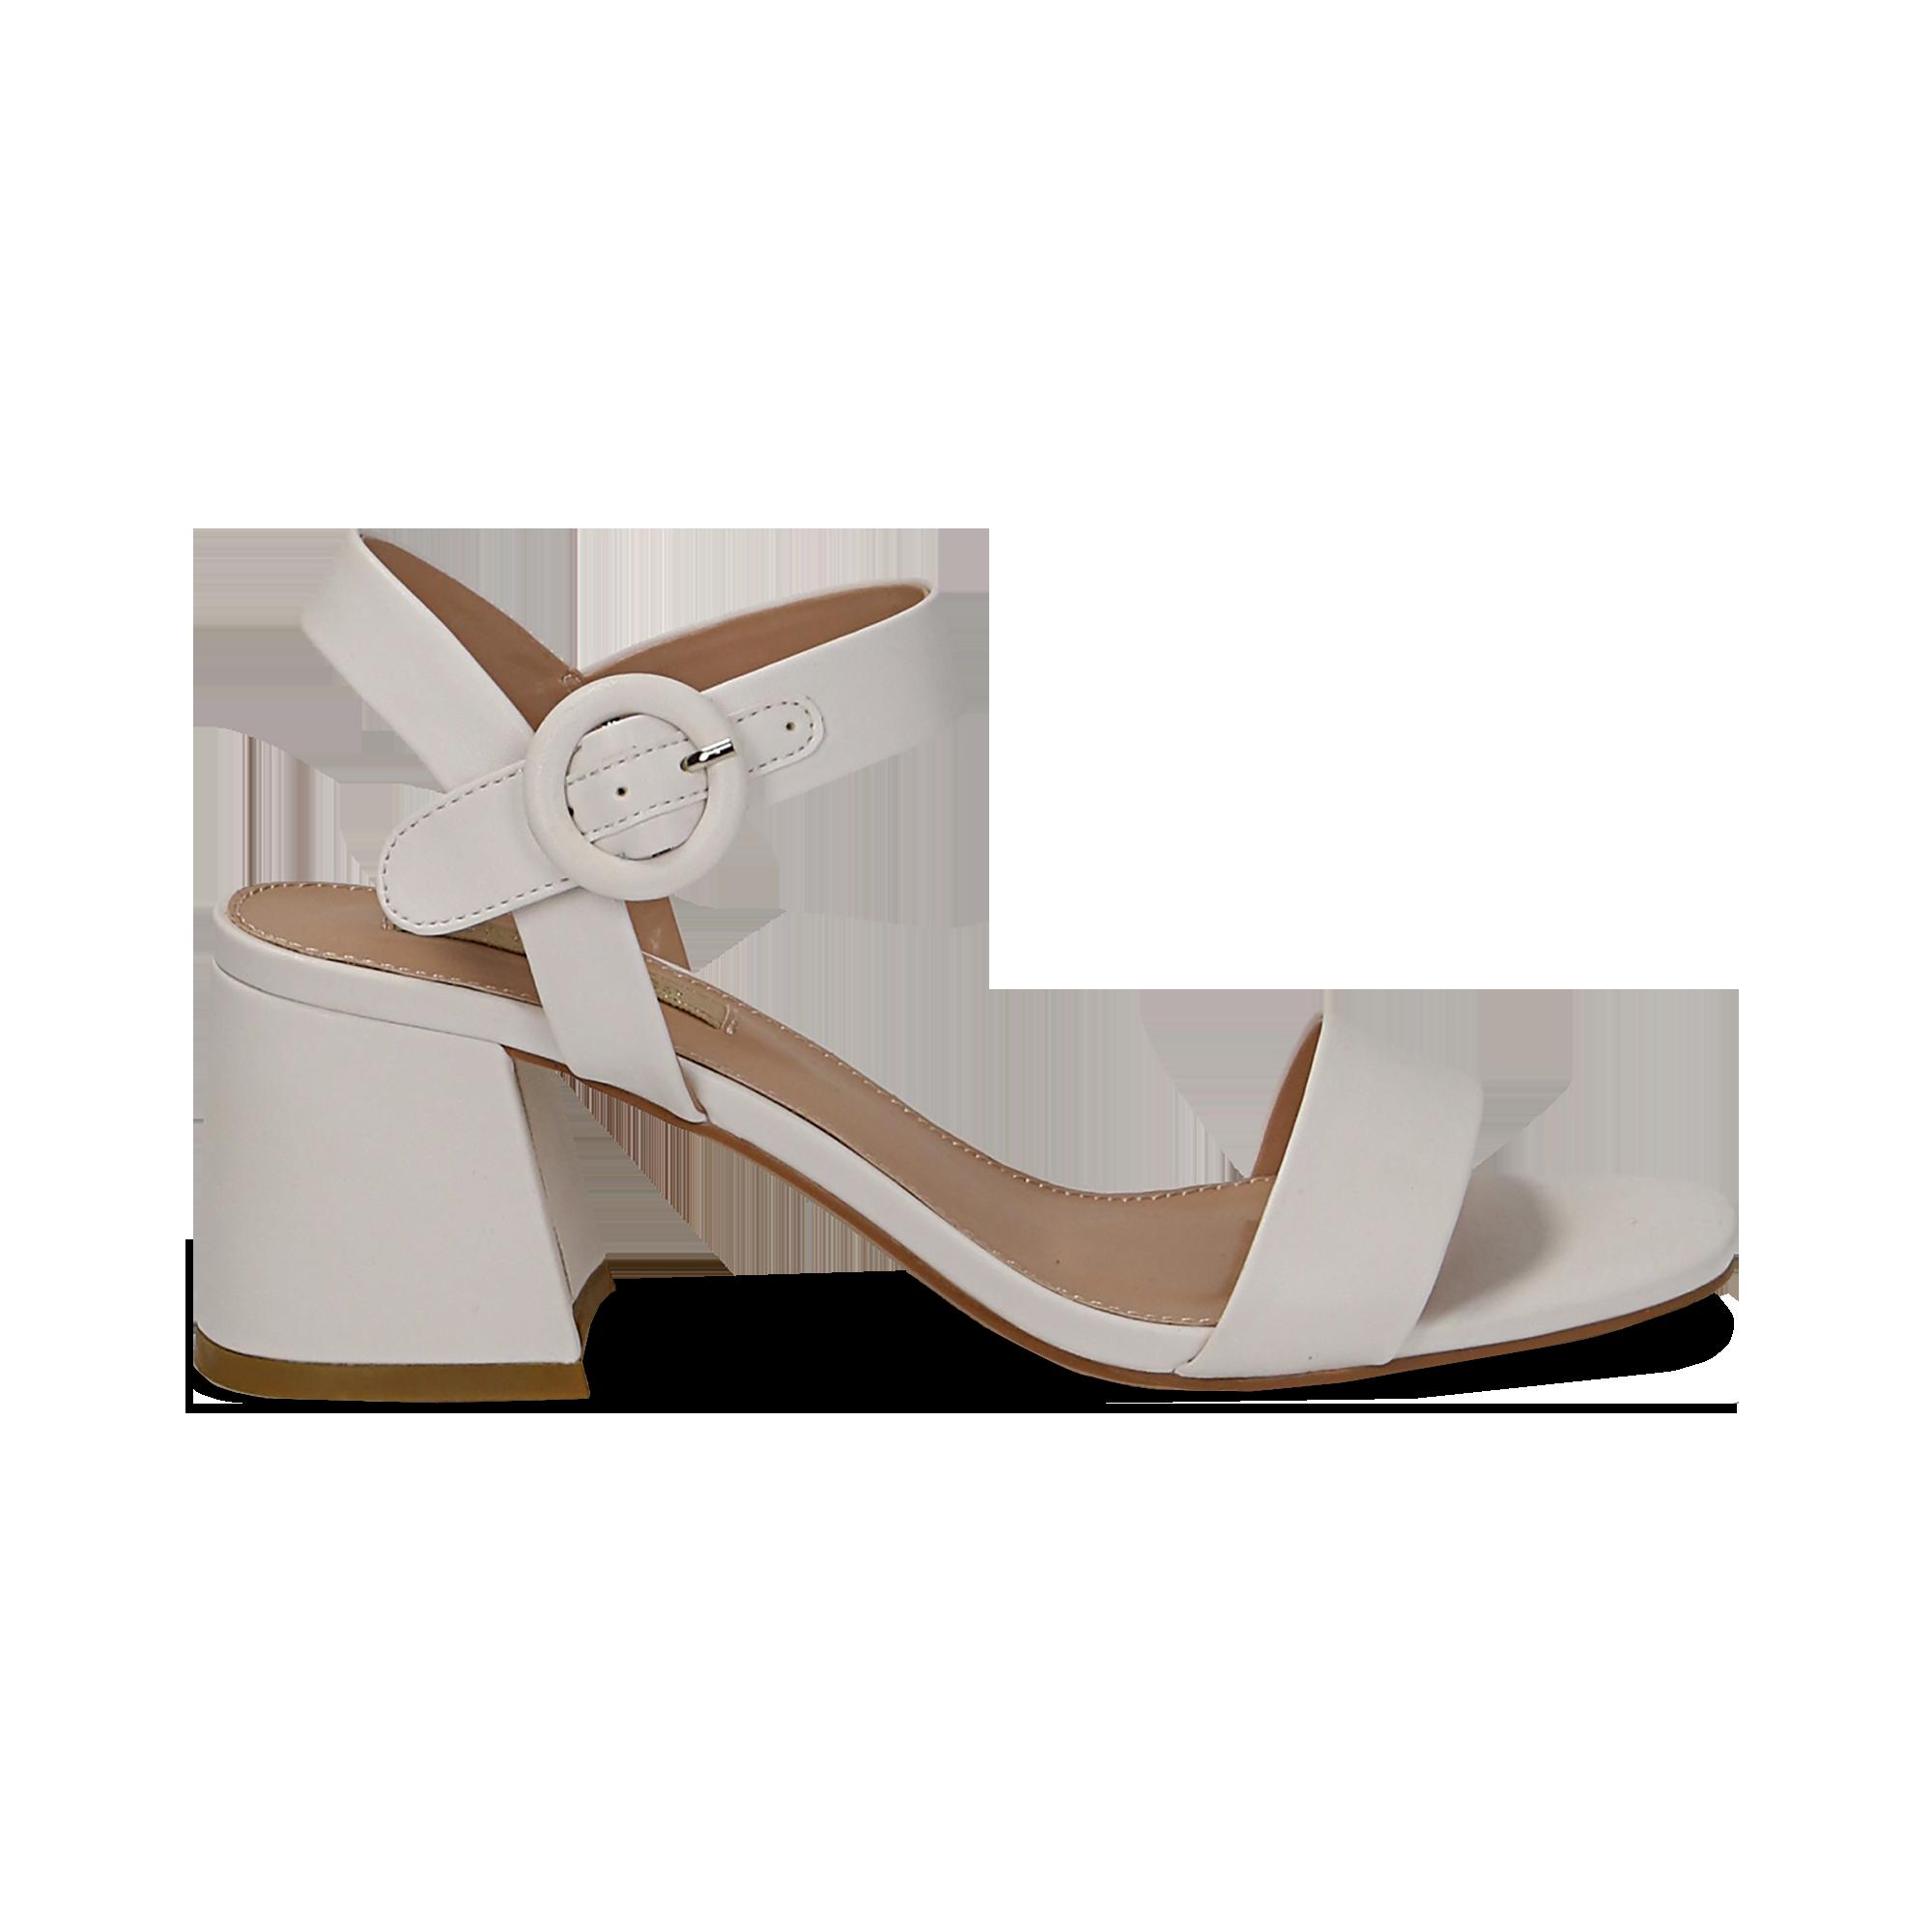 donnaPrimadonna trapezio 6 cm bianchitacco Sandali Collection tsChQdrx